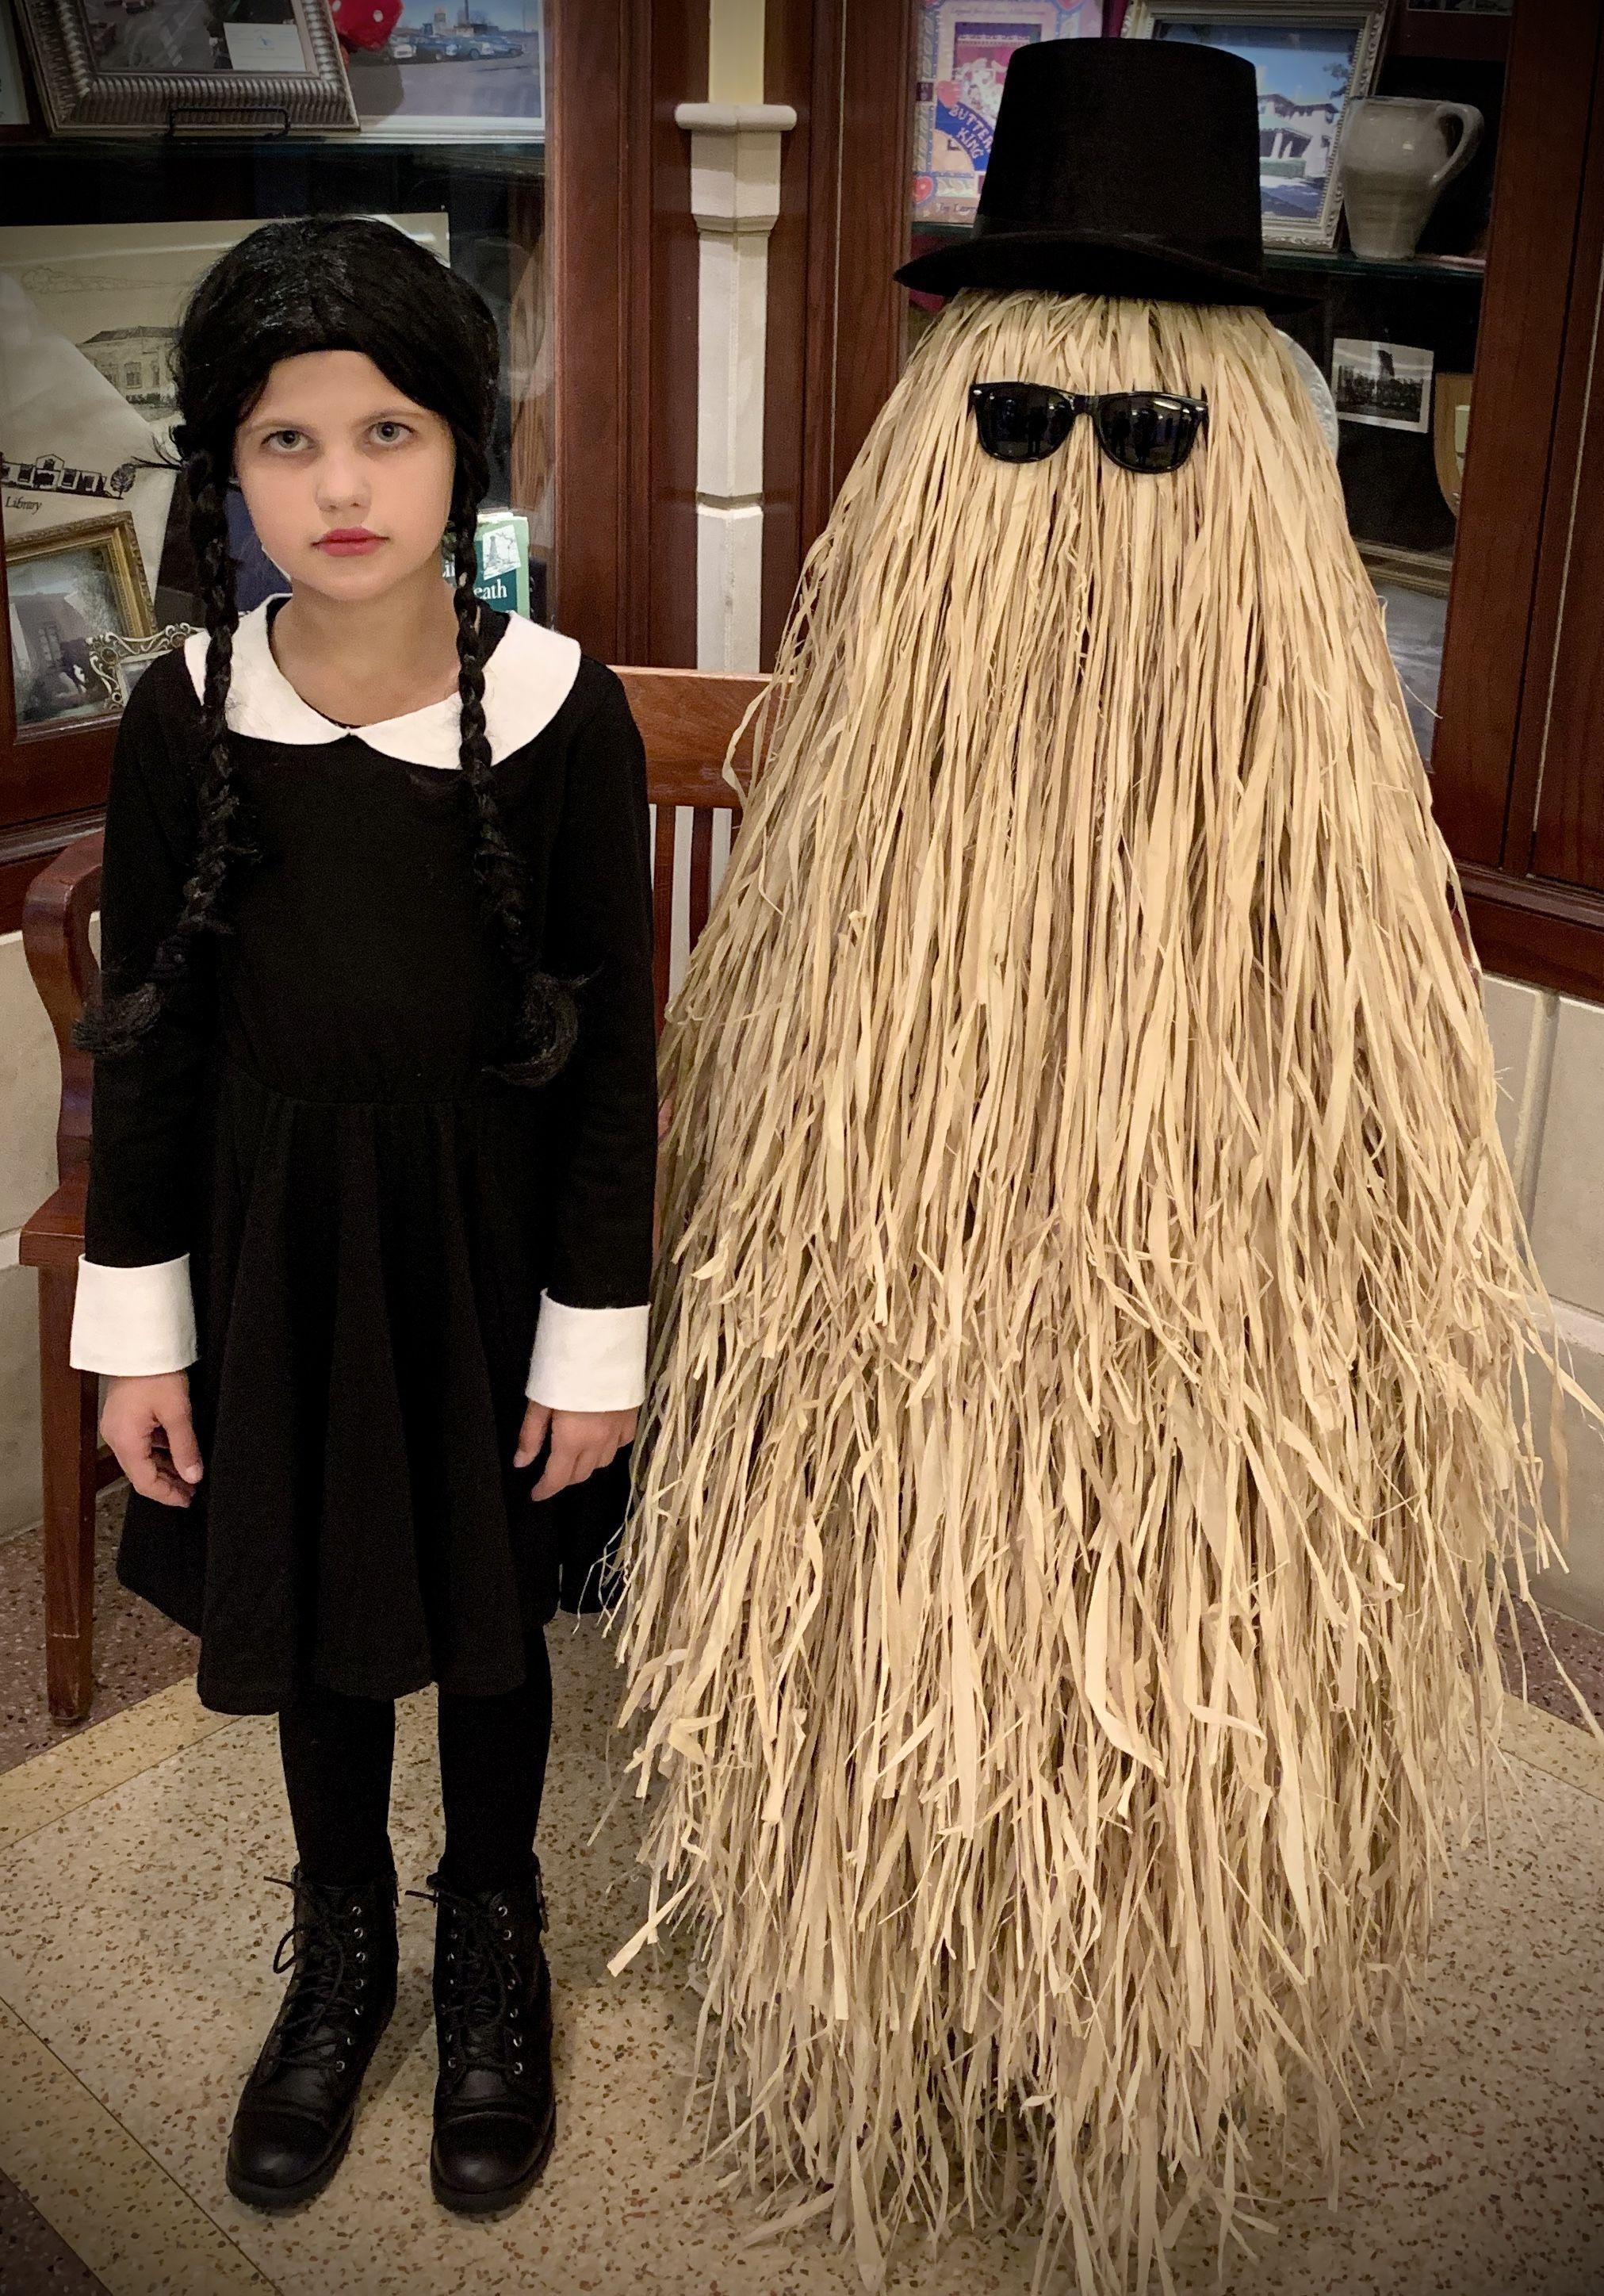 Halloween Contest Winner 2020 Wednesday Addams and Cousin It Halloween costume Contest winners